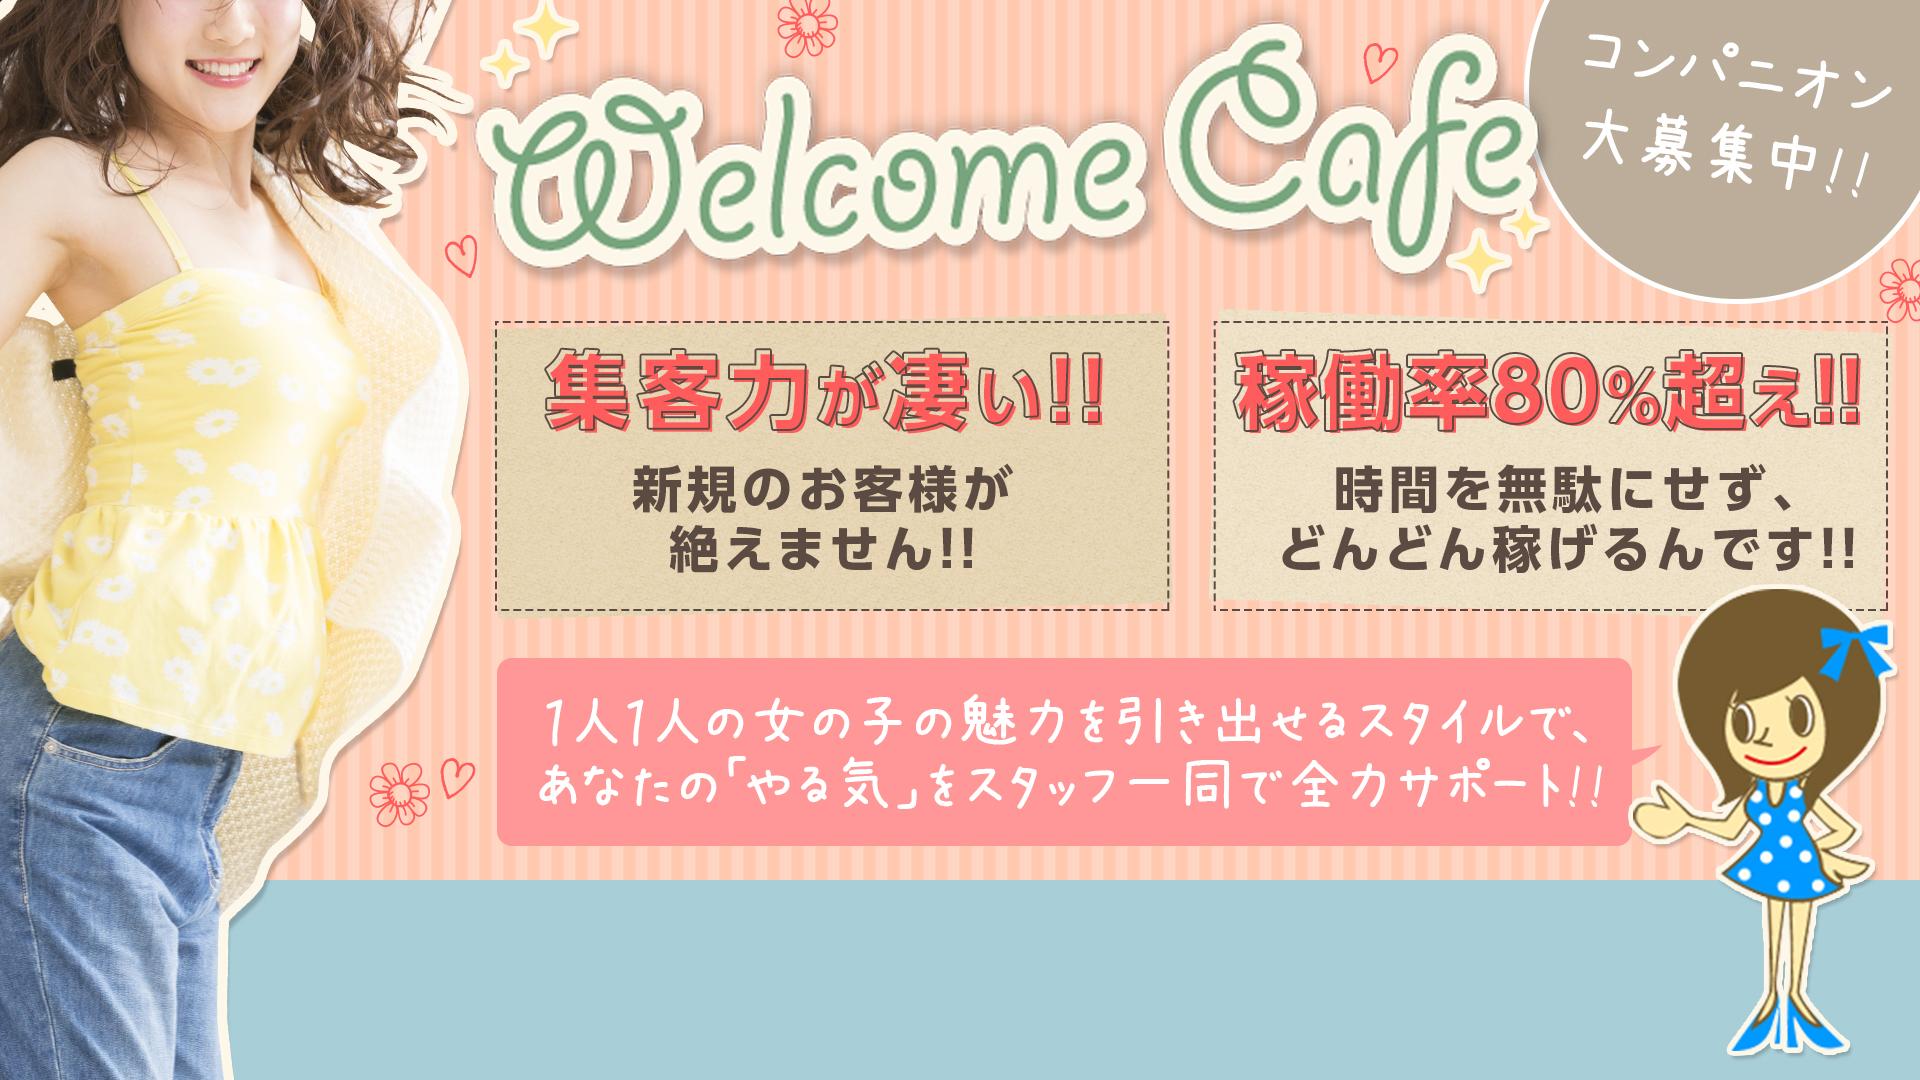 Welcome Cafe 吉祥寺店の求人画像